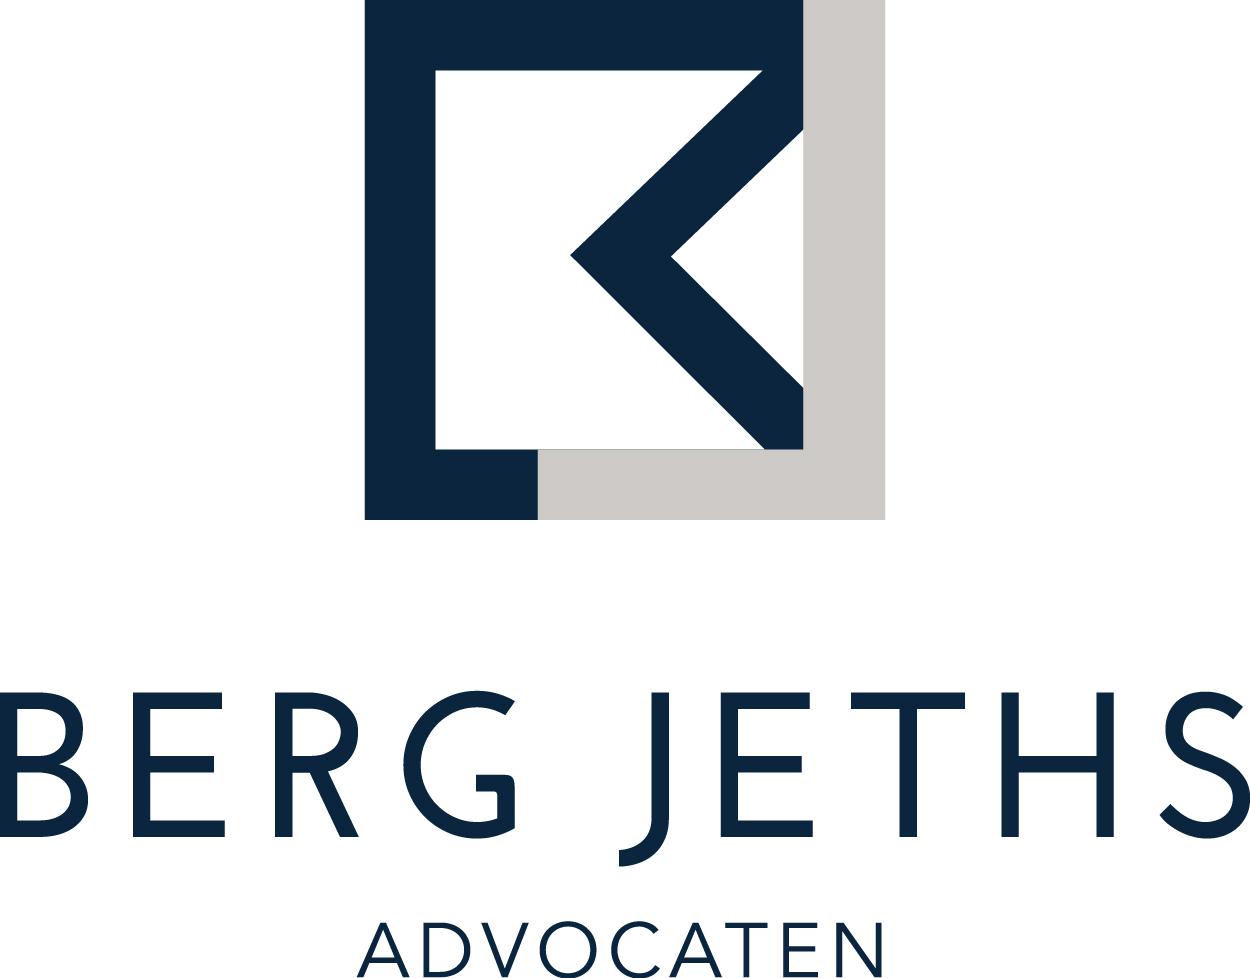 Berg Jeths Advocaten